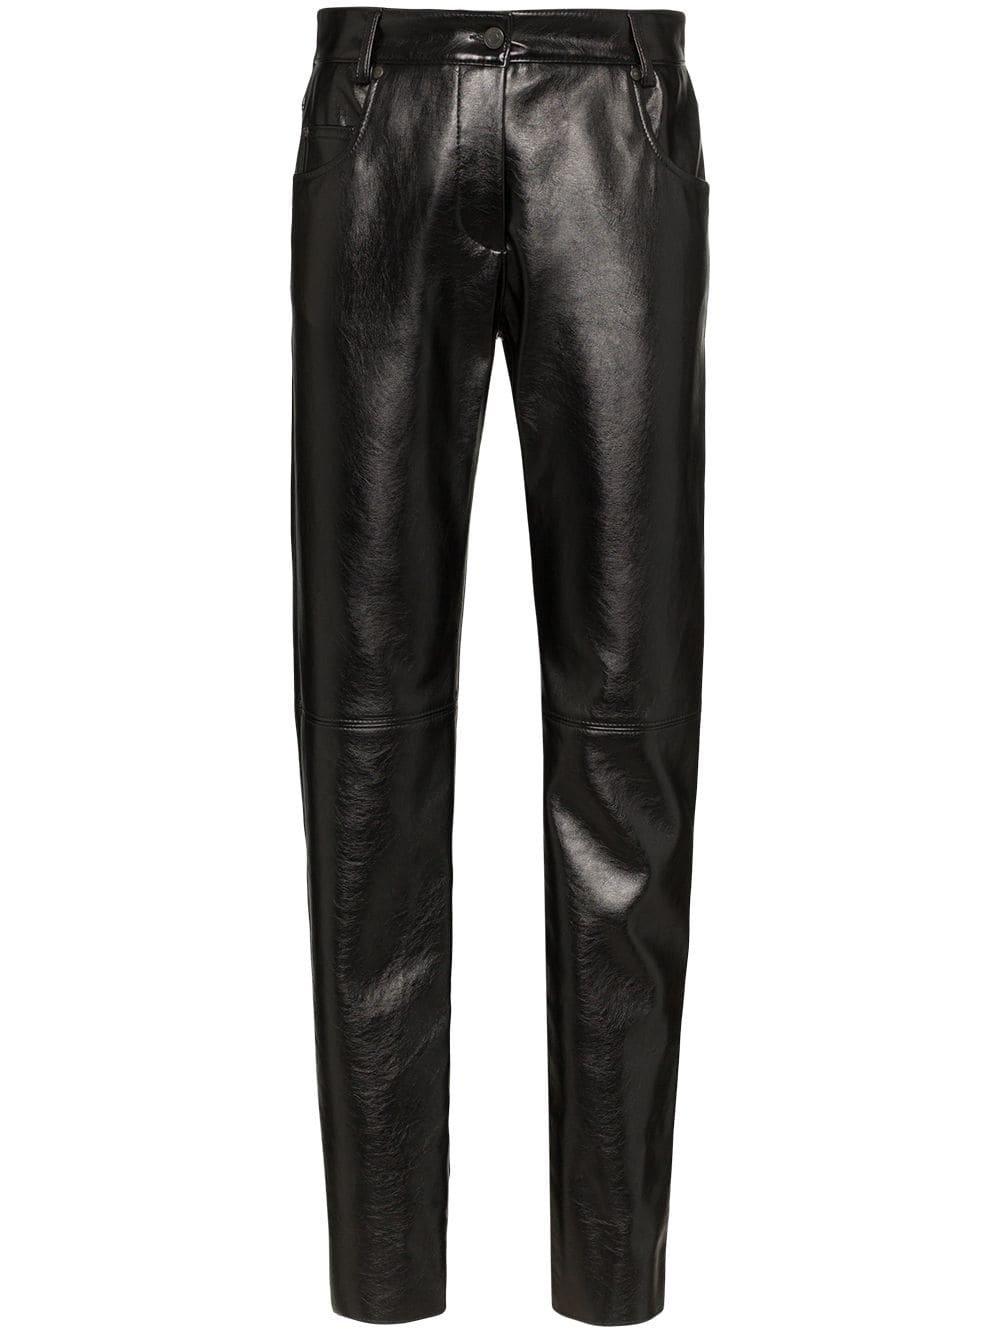 Black Msgm Slim-Fit Trousers | Farfetch.com